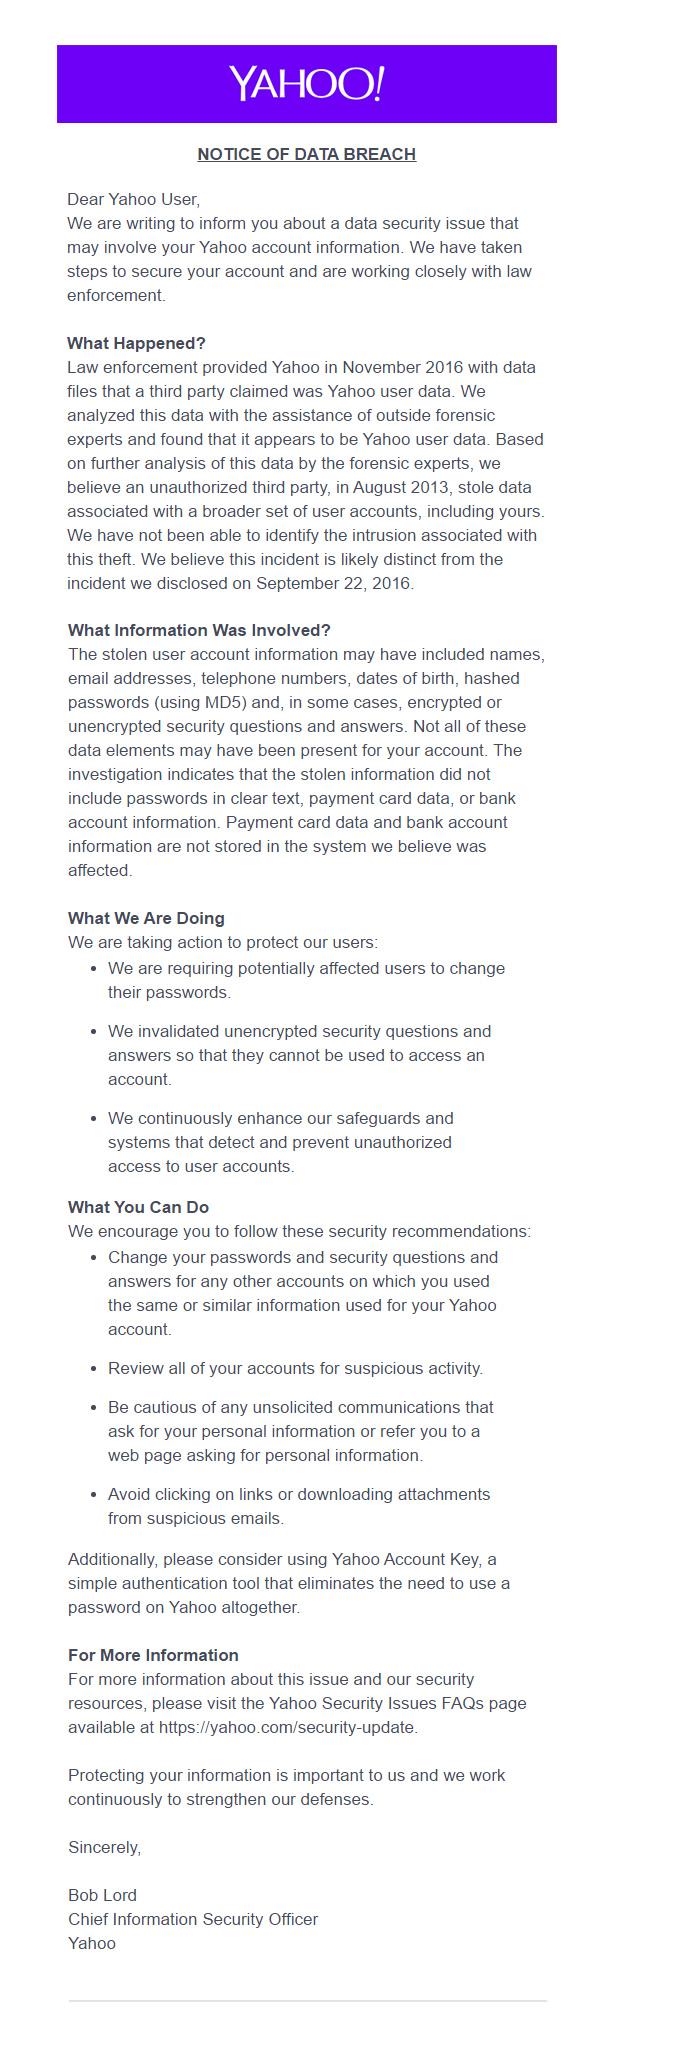 Yahoo email hack 2013